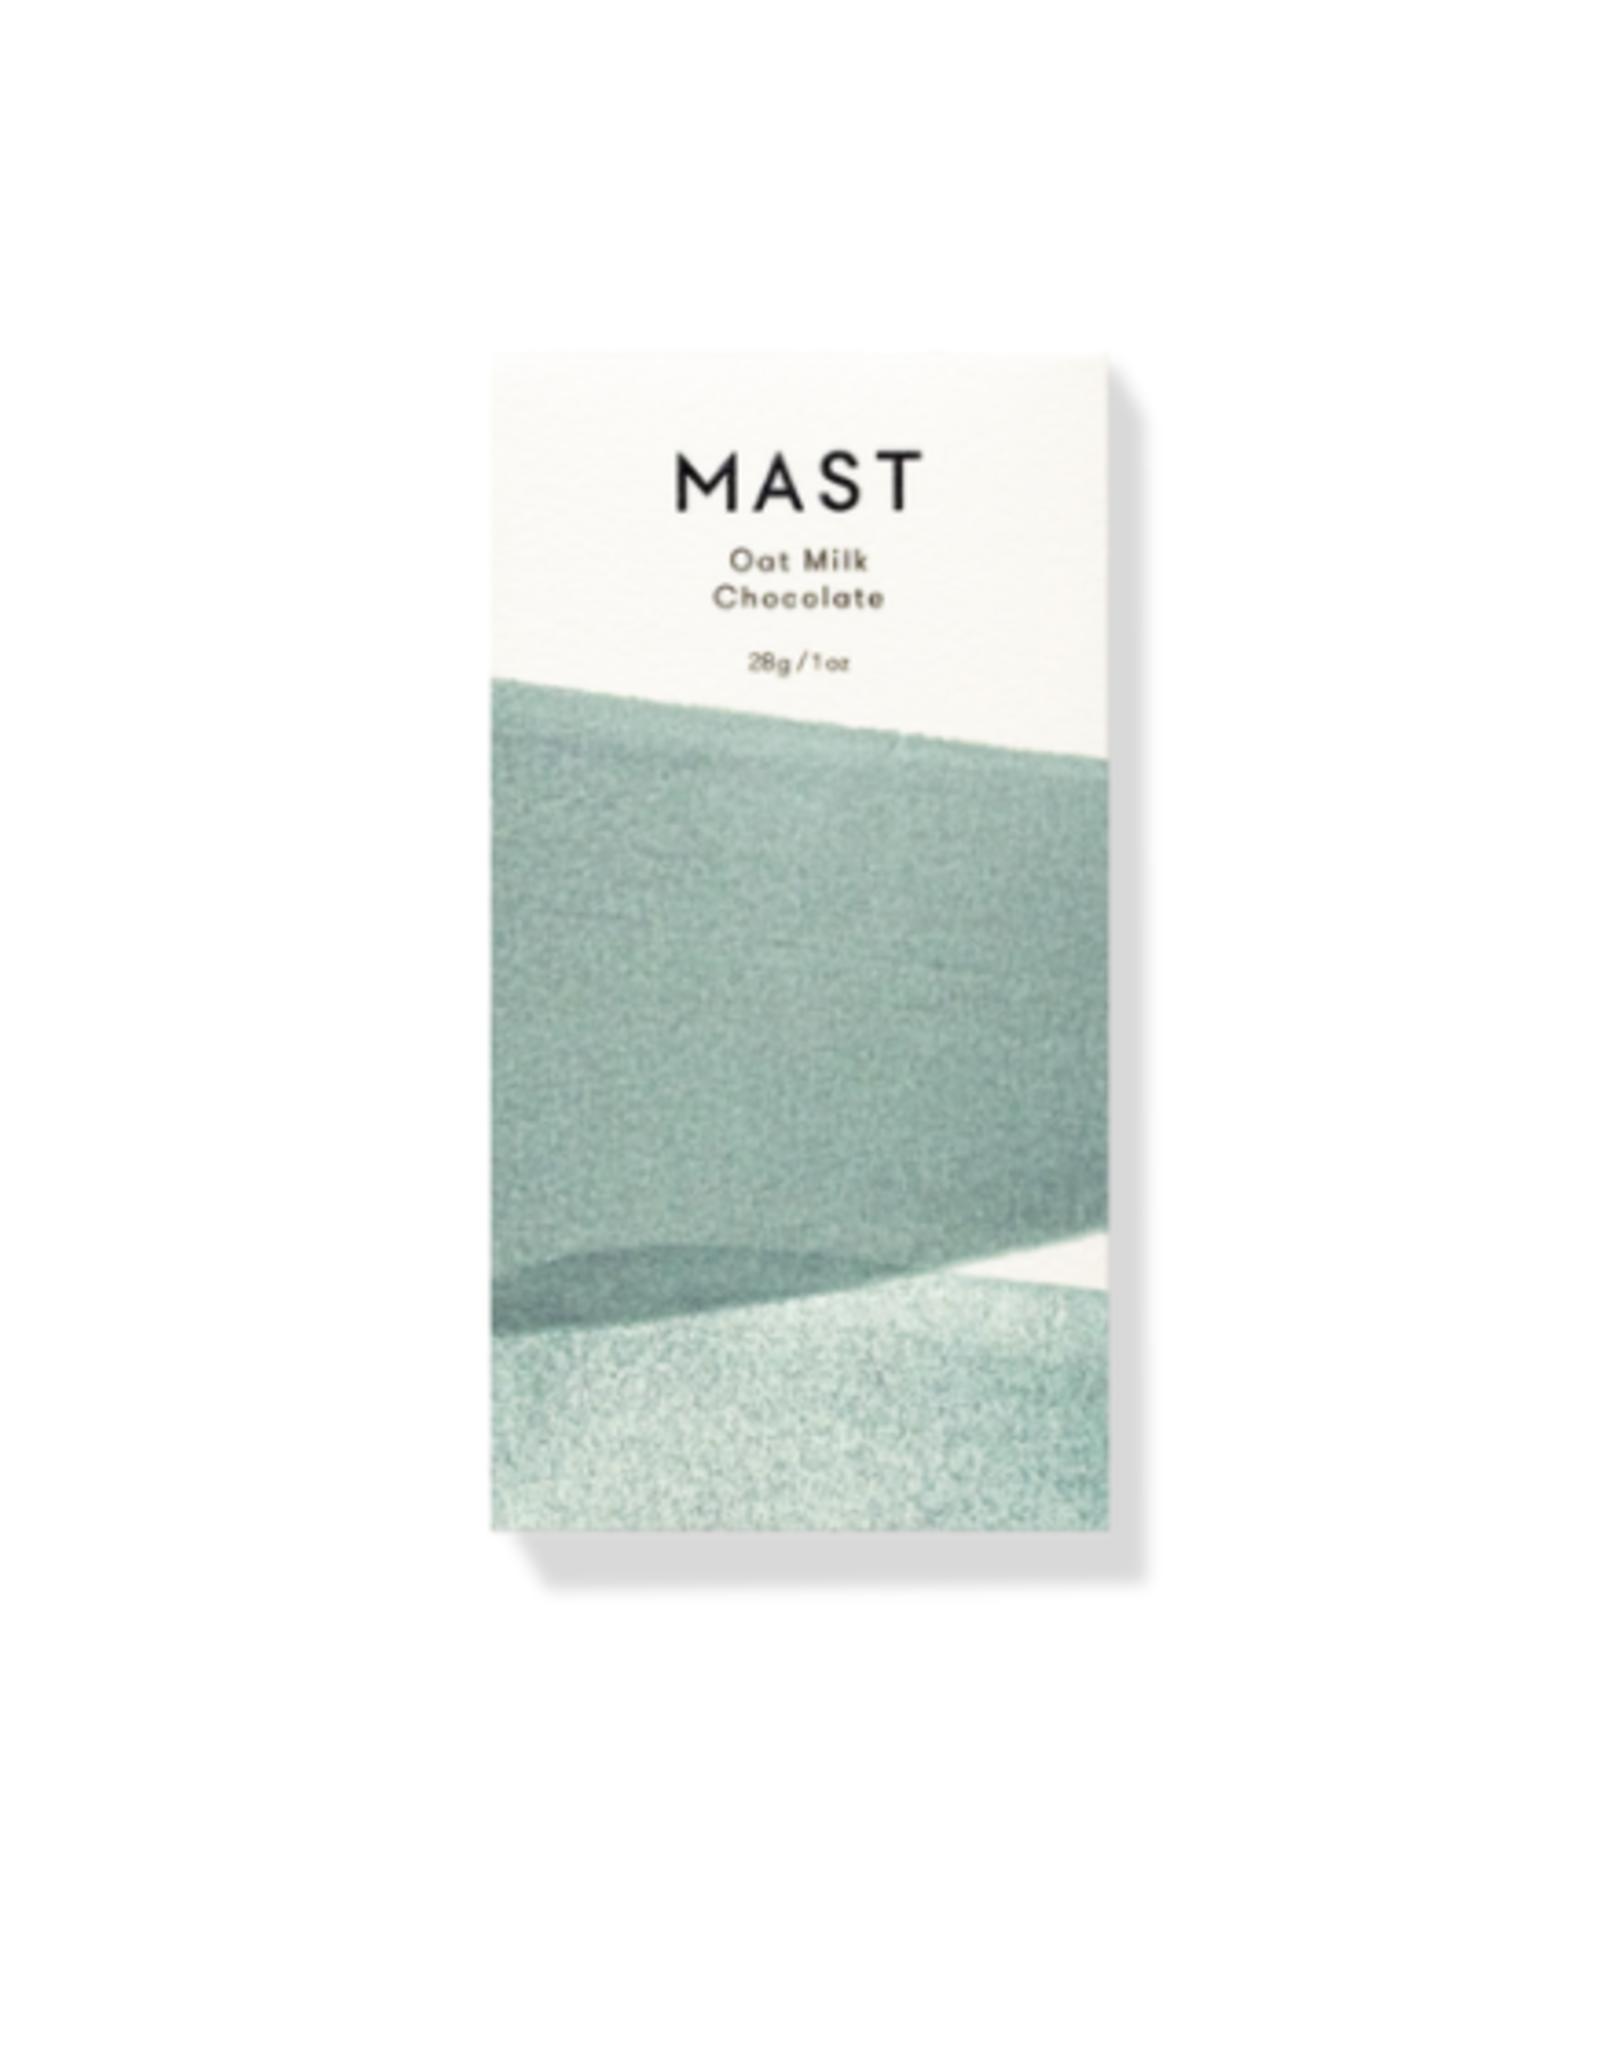 Mast Mast Mini - Oat Milk Chocolate